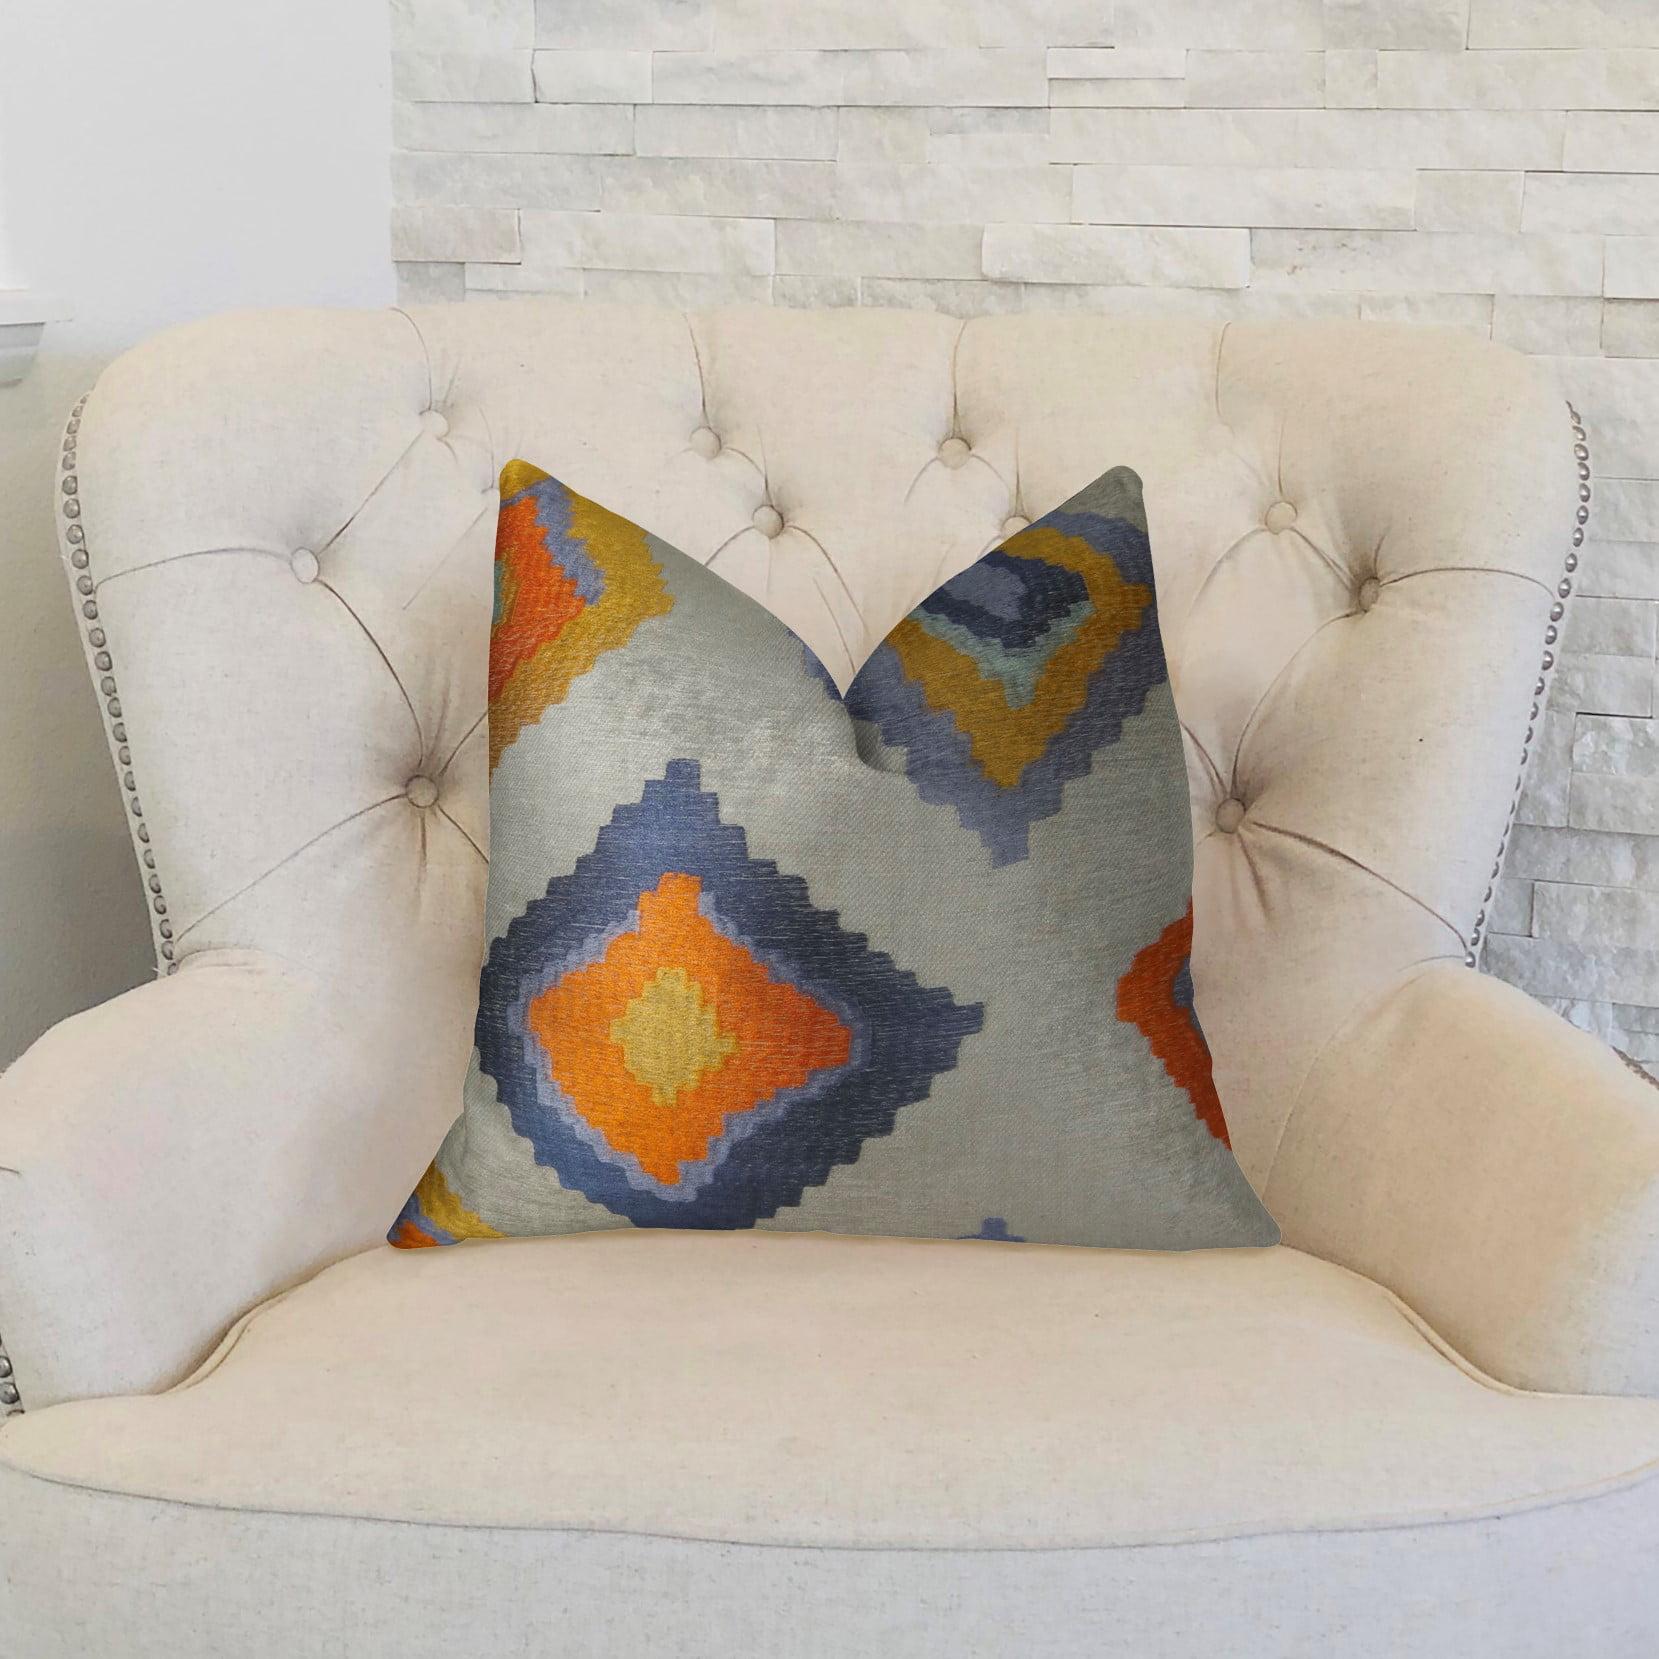 Plutus PBRAZ360-2026-DP Isabeau Purple Orange & White Handmade Luxury Pillow, 20 x 26 in. Standard - image 2 of 3